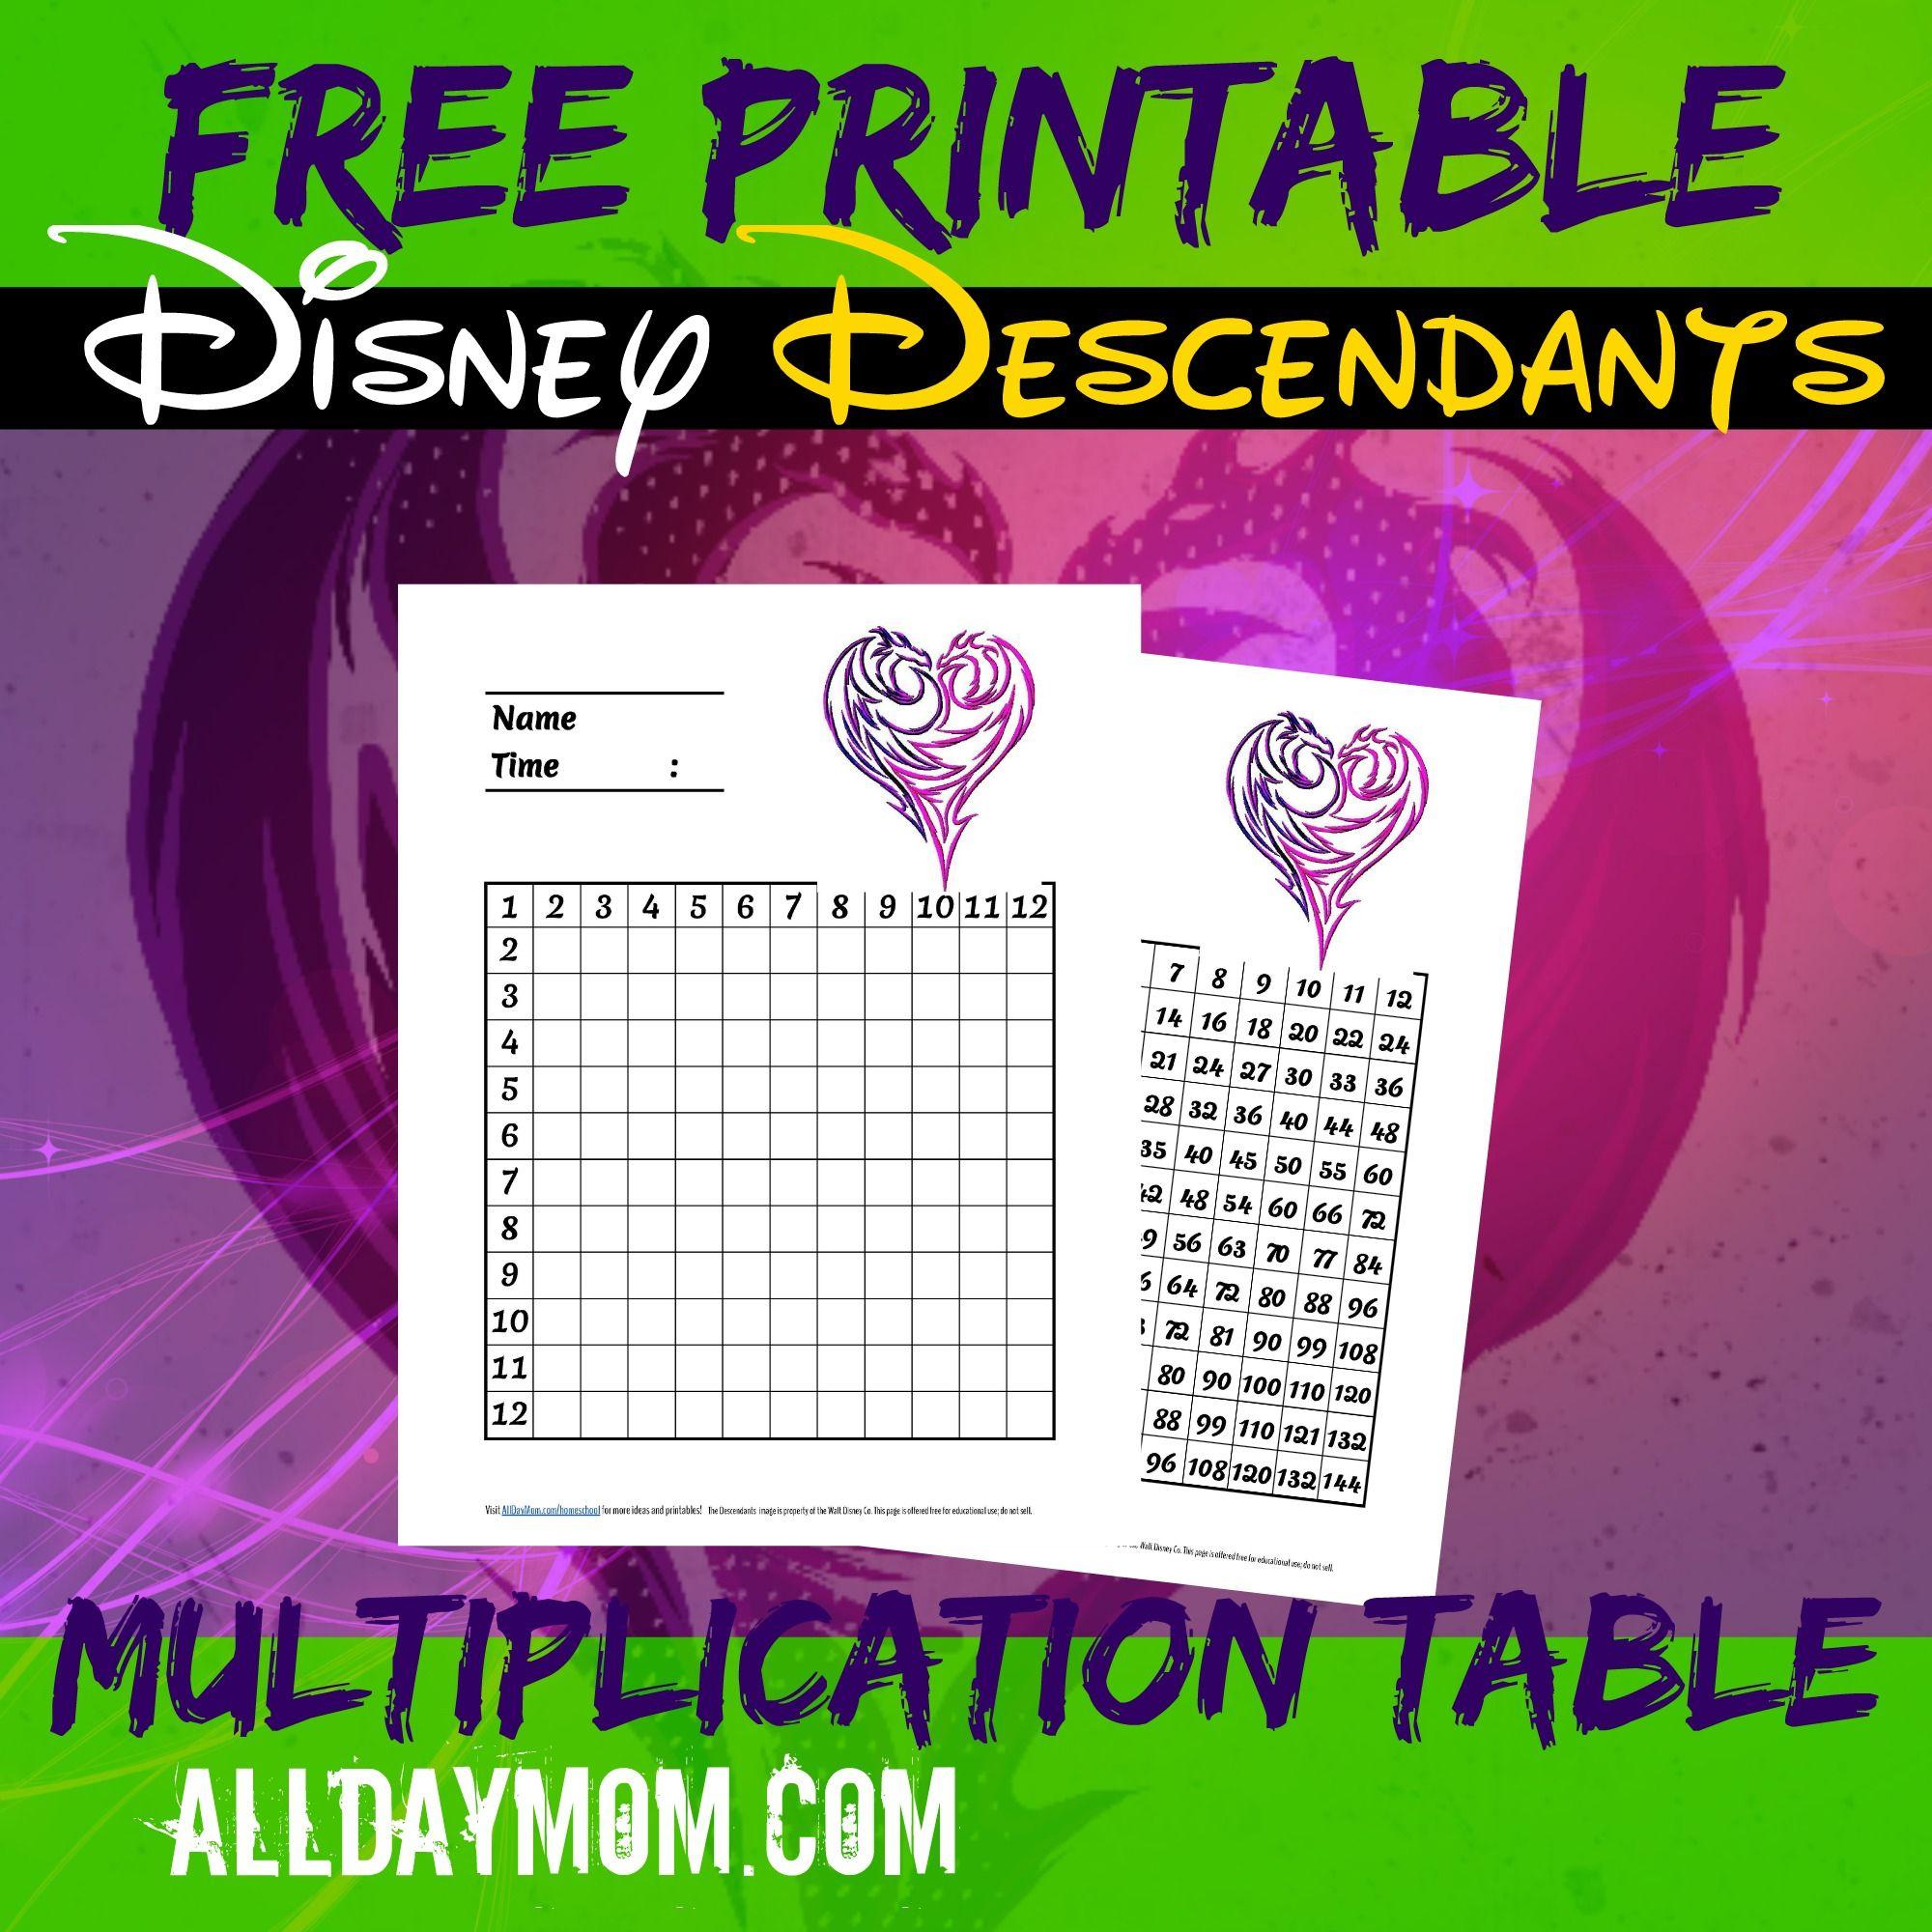 Free printable Disney Descendants multiplication table Make